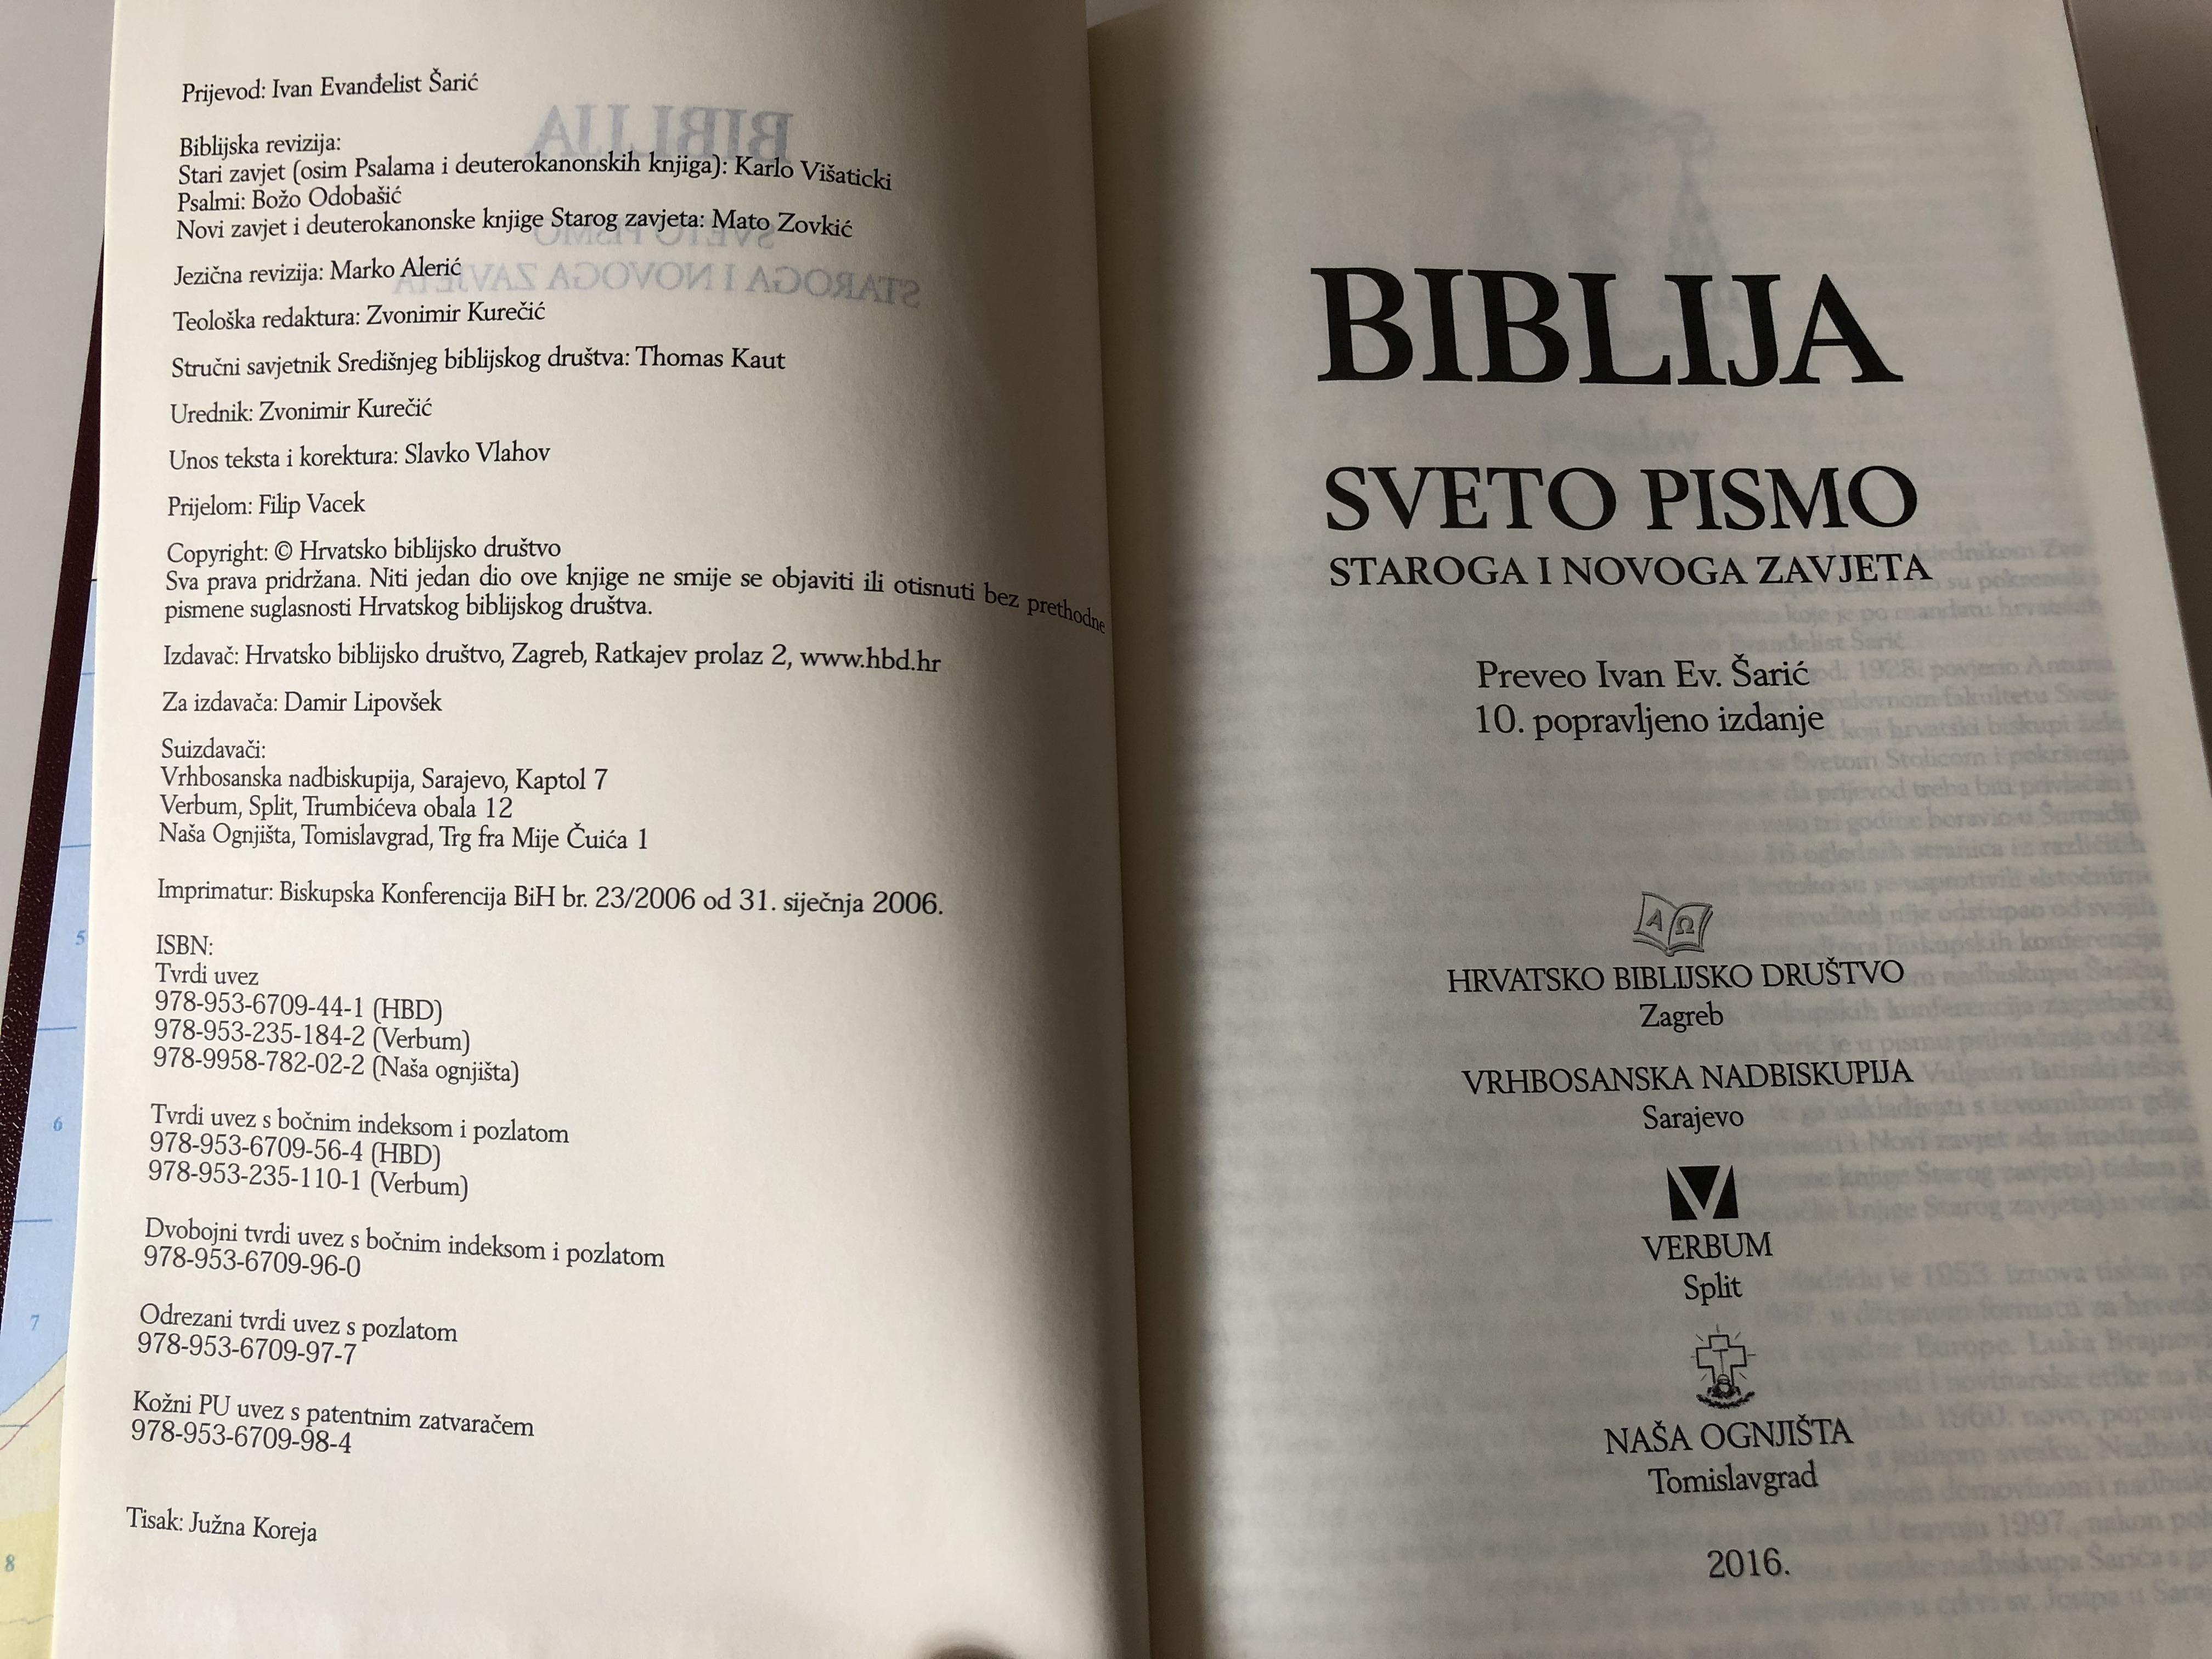 croatian-bible-with-deuterocanonical-books-burg-5-.jpg